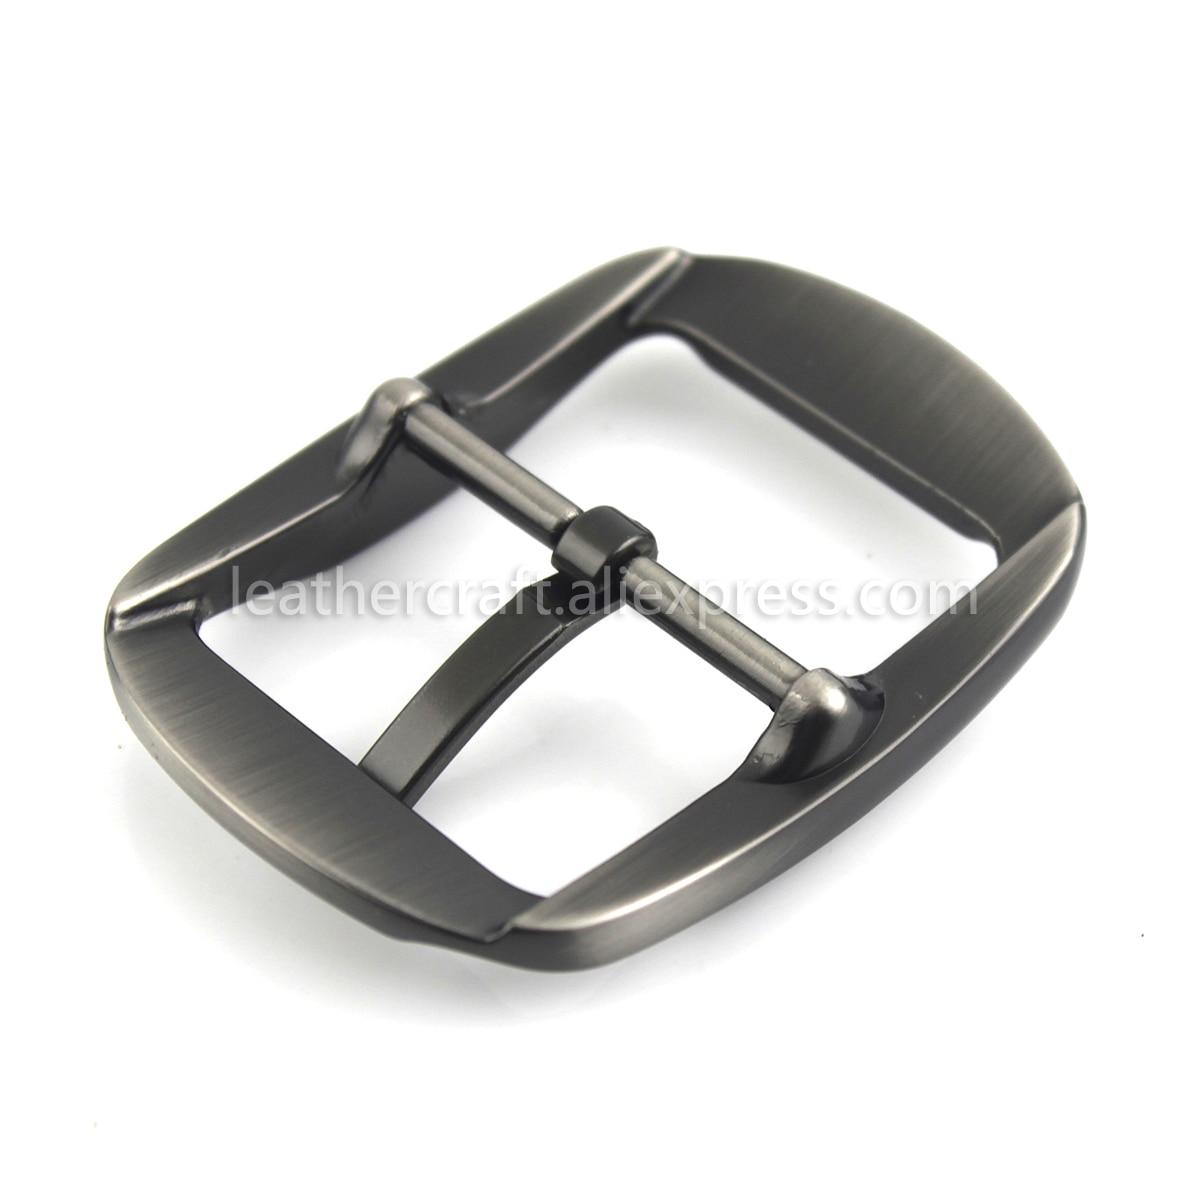 Heavy Duty Silver Round Center Bar Replacement Men/'s Belt Buckle Fits 40mm Belts